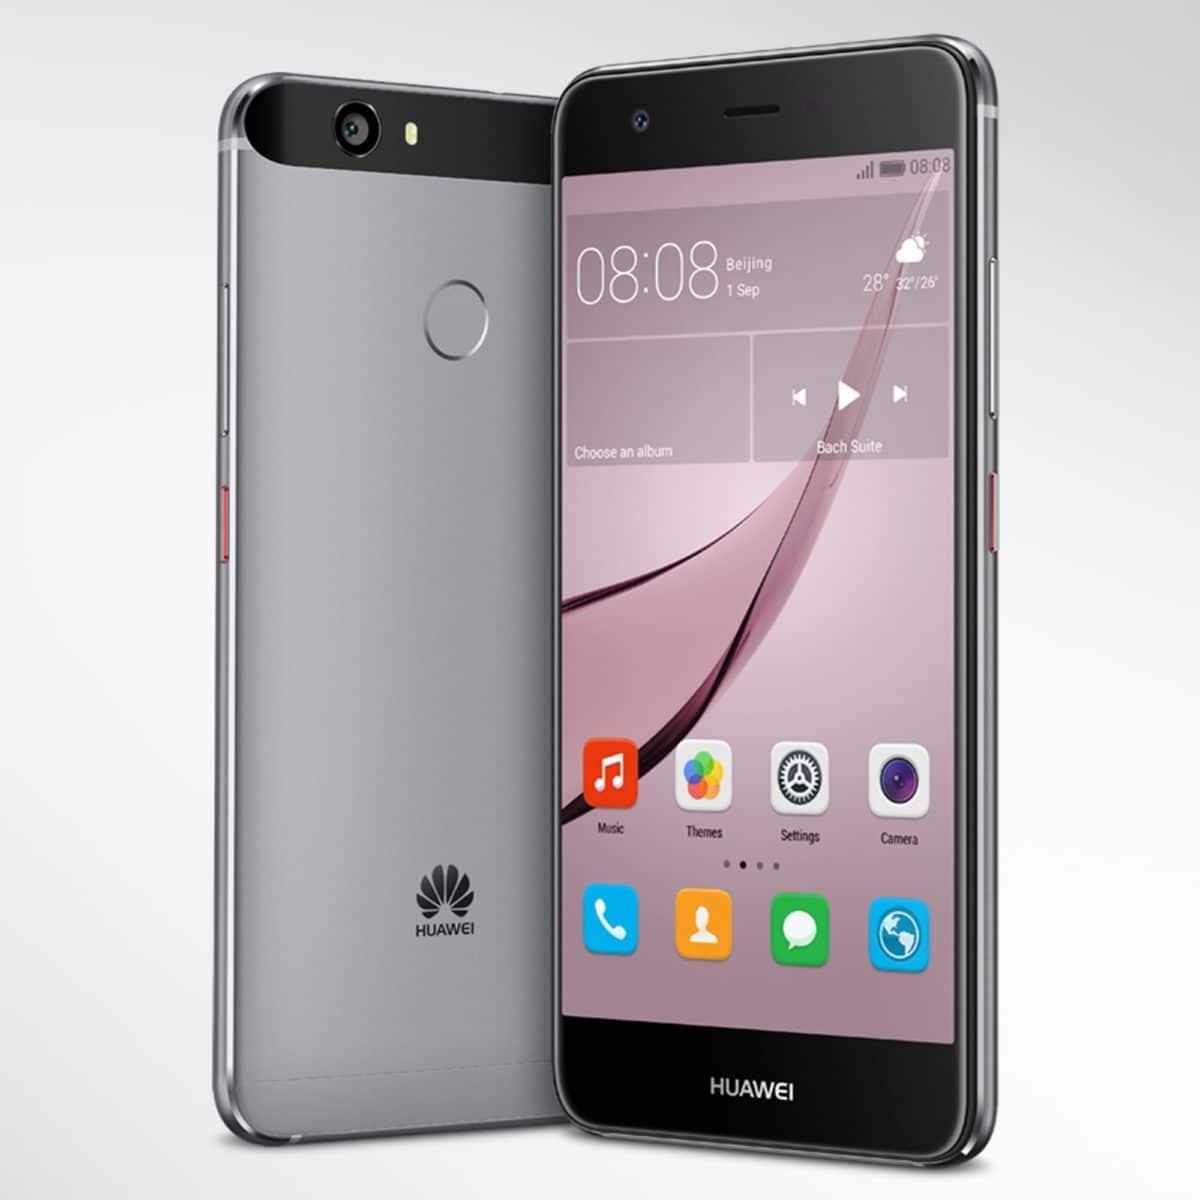 Huawei Nova und Nova Plus: Neue Smartphones offiziell vorgestellt 3